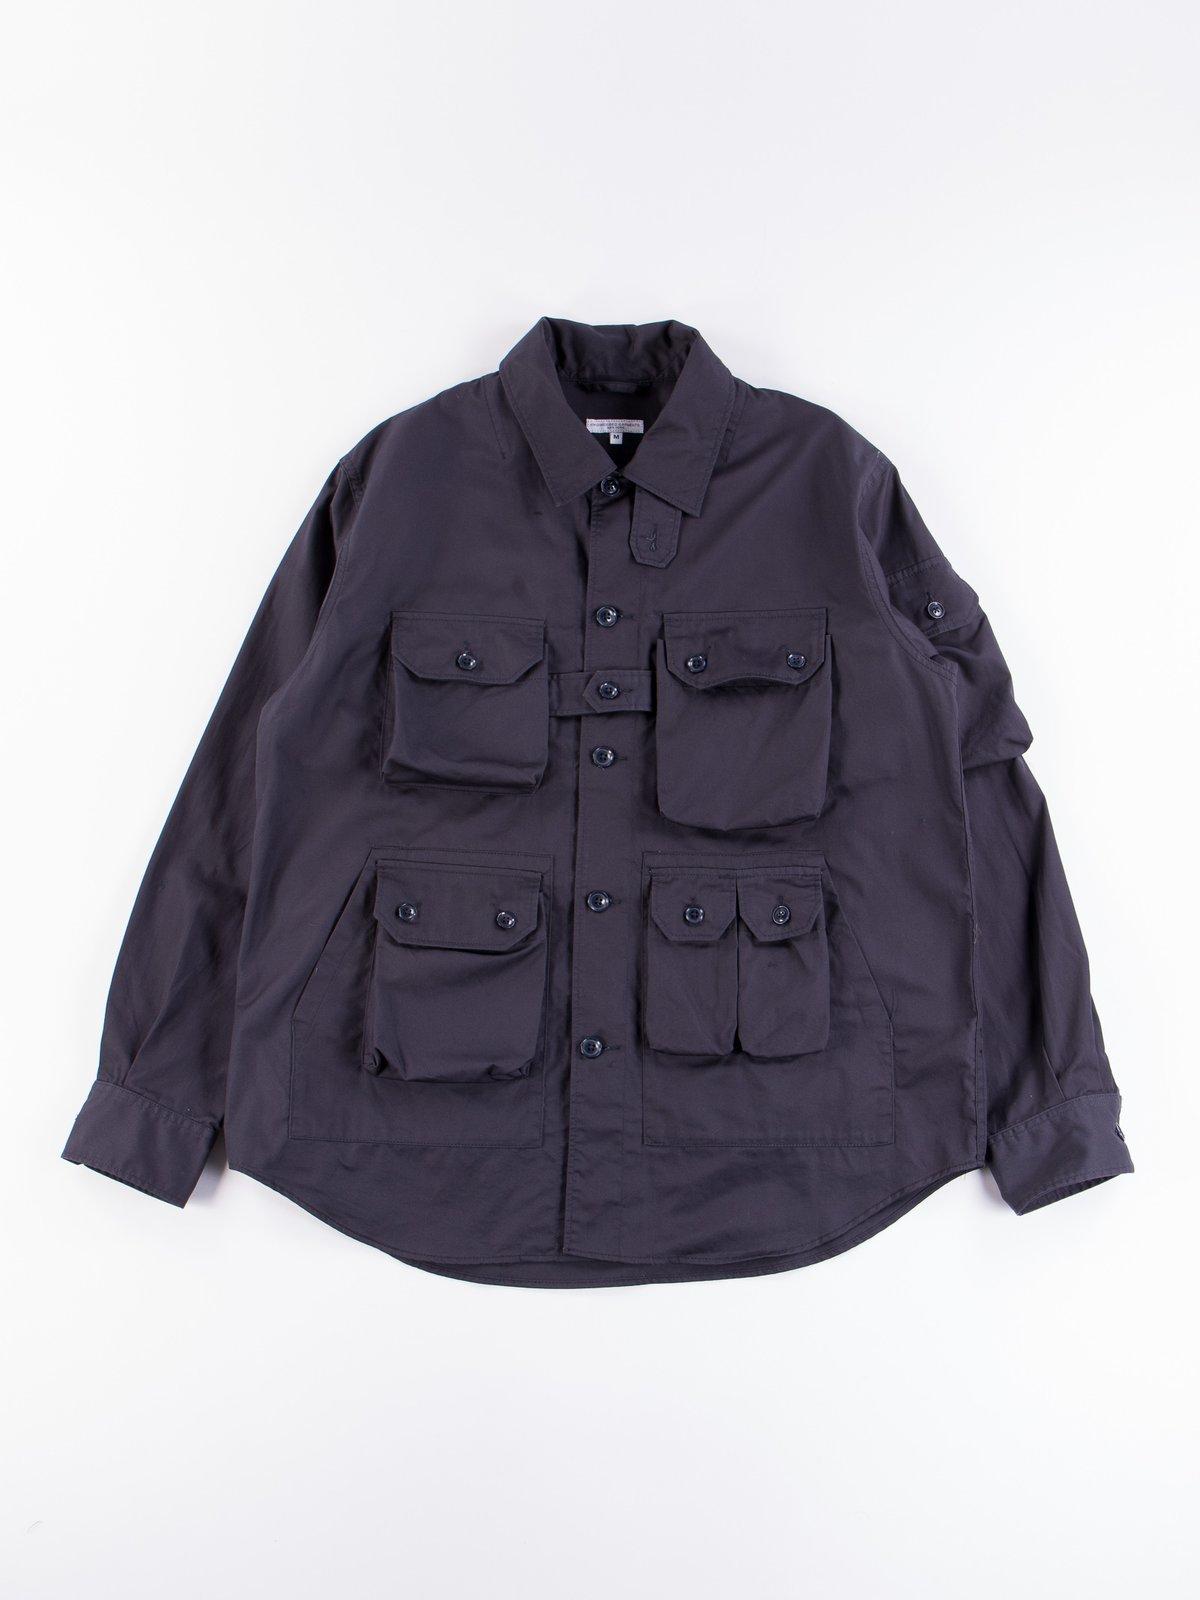 Dark Navy Highcount Twill Explorer Shirt Jacket - Image 1